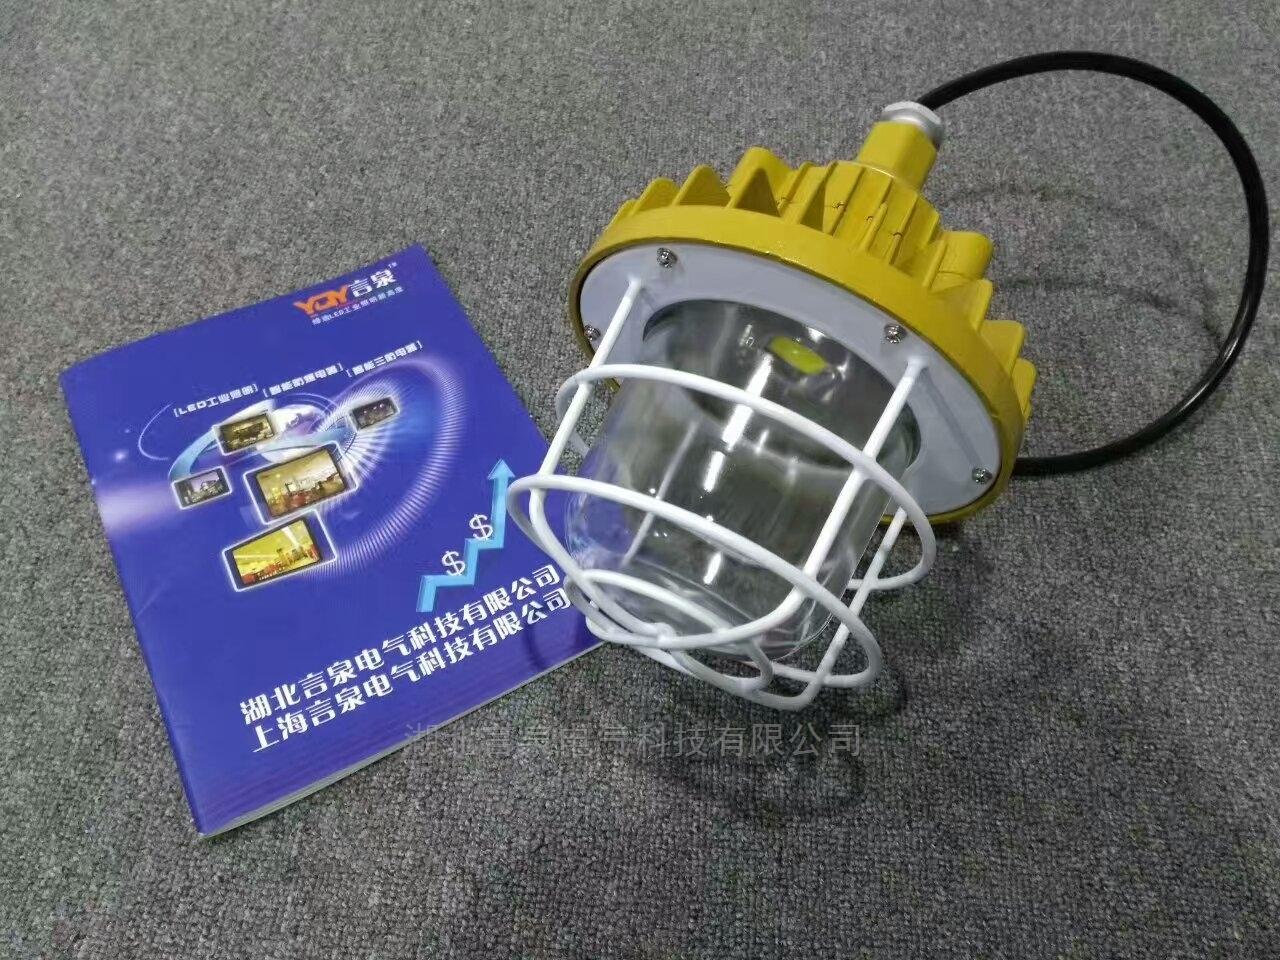 kHD240防爆防腐免维护节能灯染料间灯